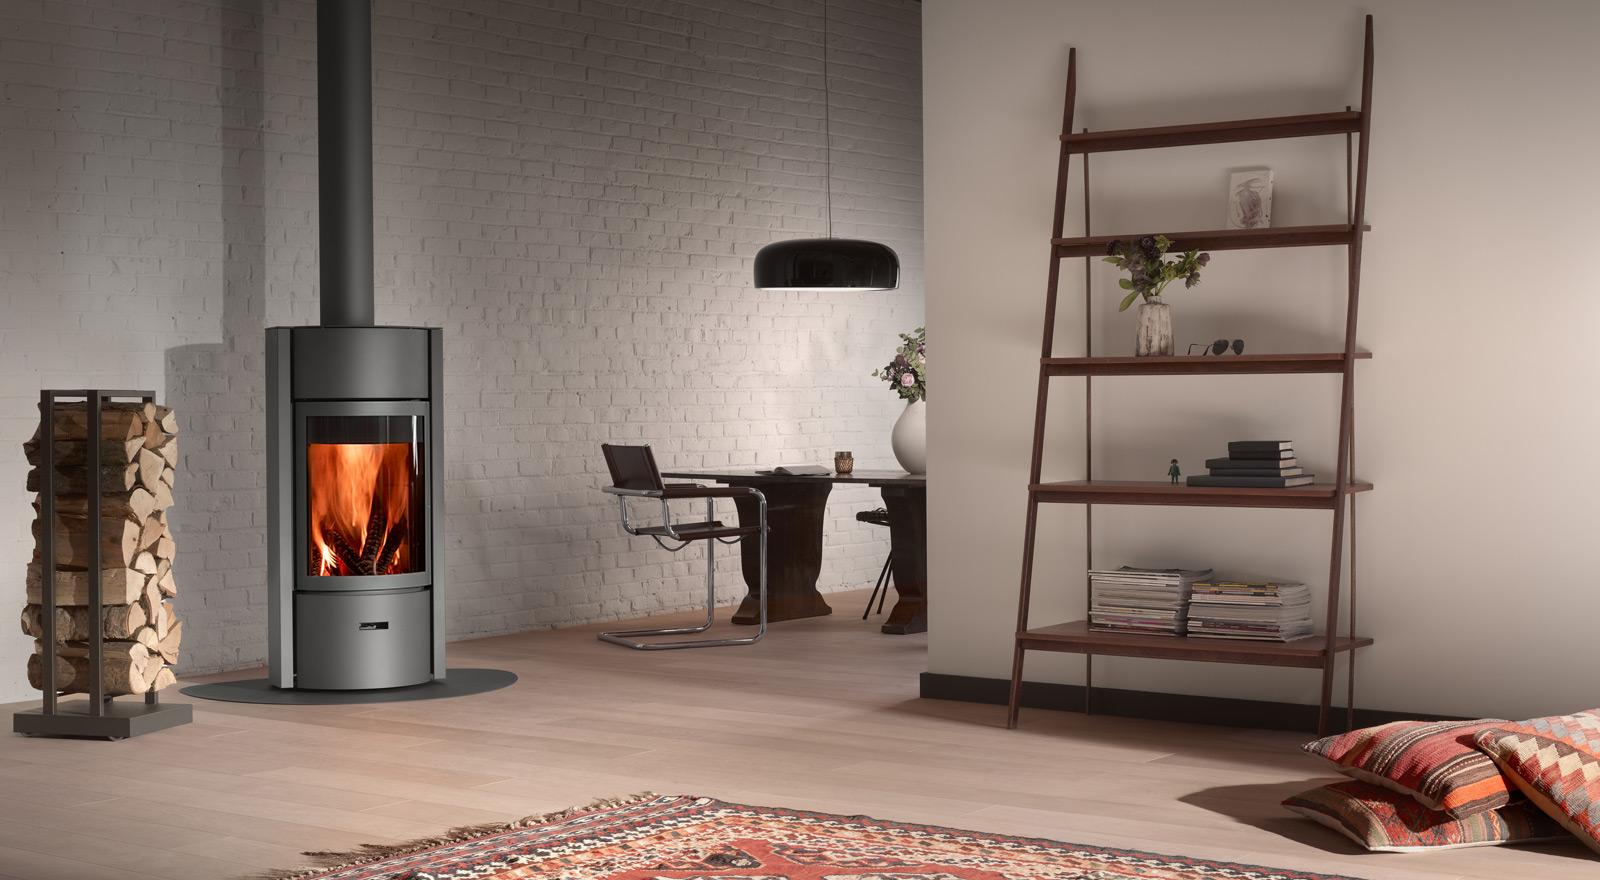 poele insert cheminee au bois stuv 30 st v. Black Bedroom Furniture Sets. Home Design Ideas